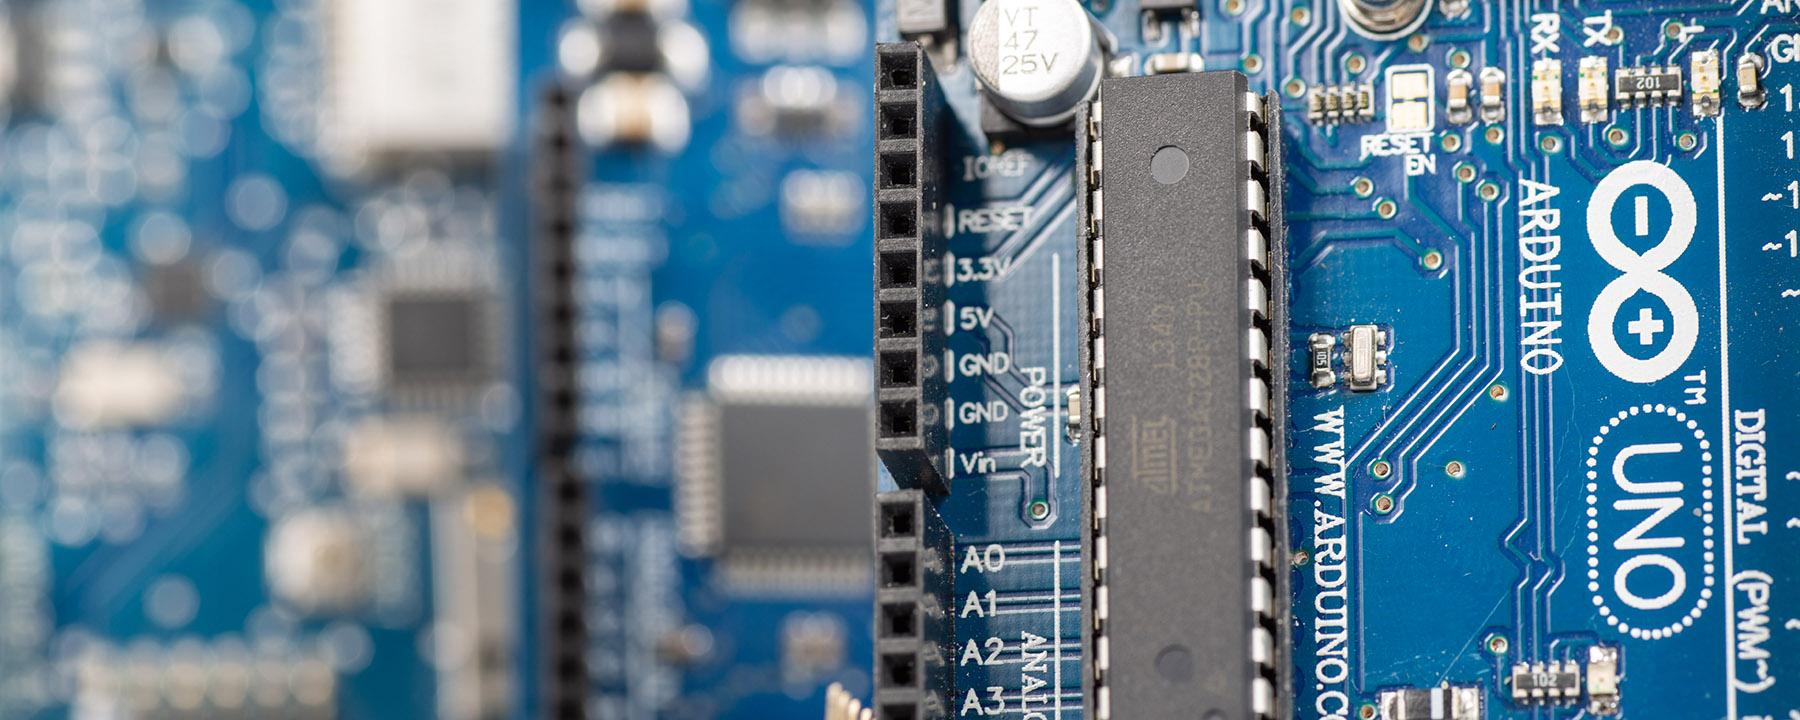 Microprocessor-vs-Microcontroller-vs-Microcomputer-1.jpg